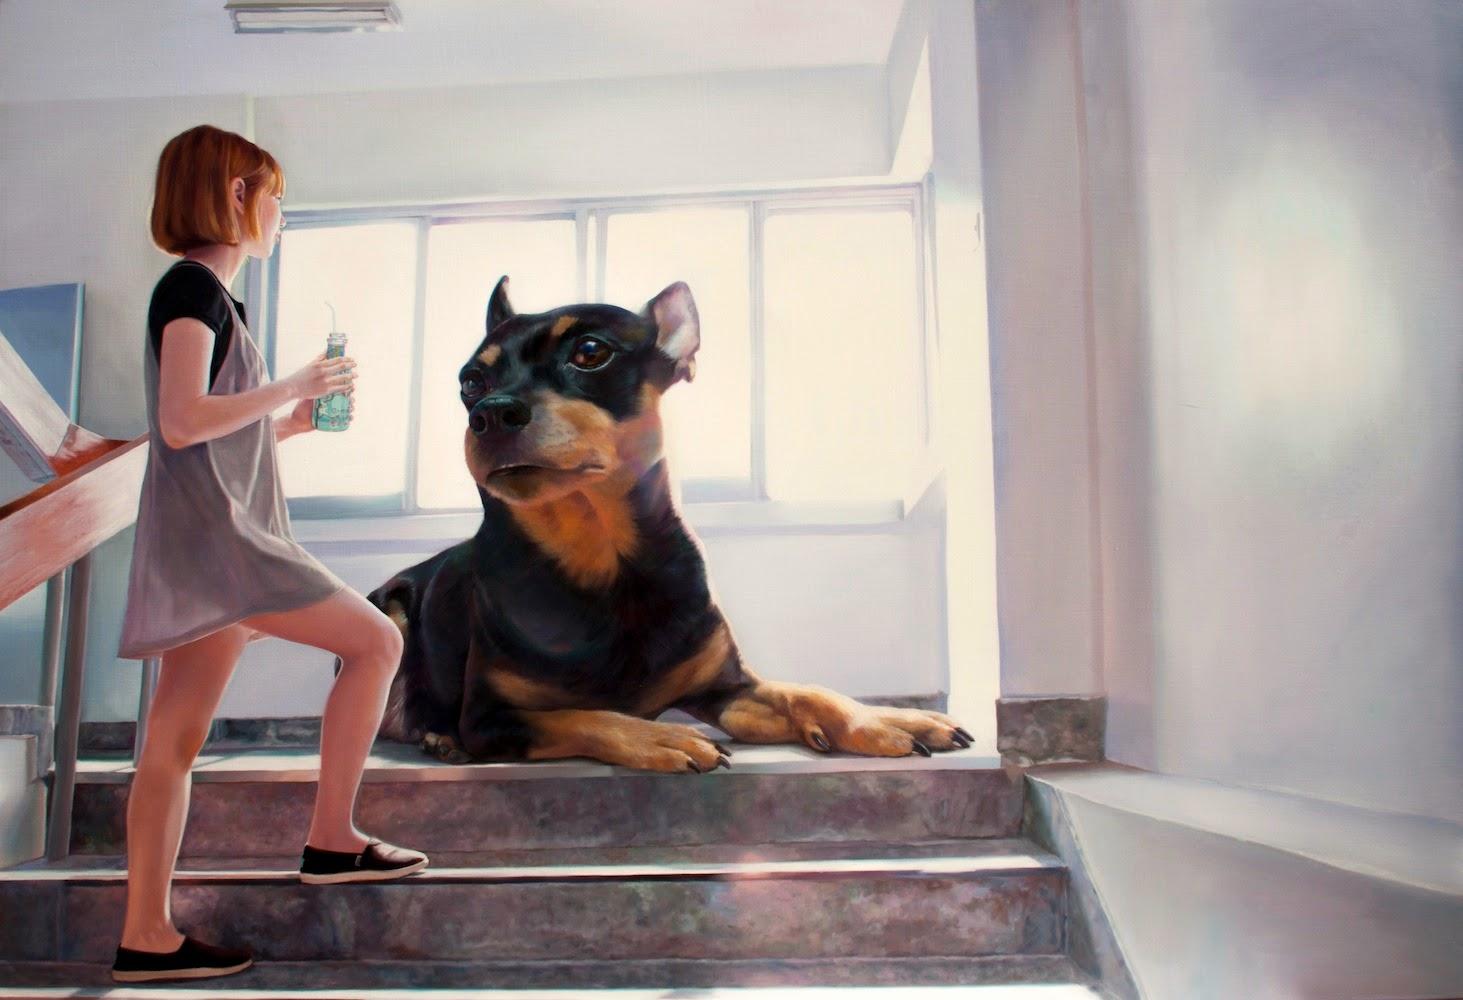 The Girl and Her Dog   © Jeong Woo Jae